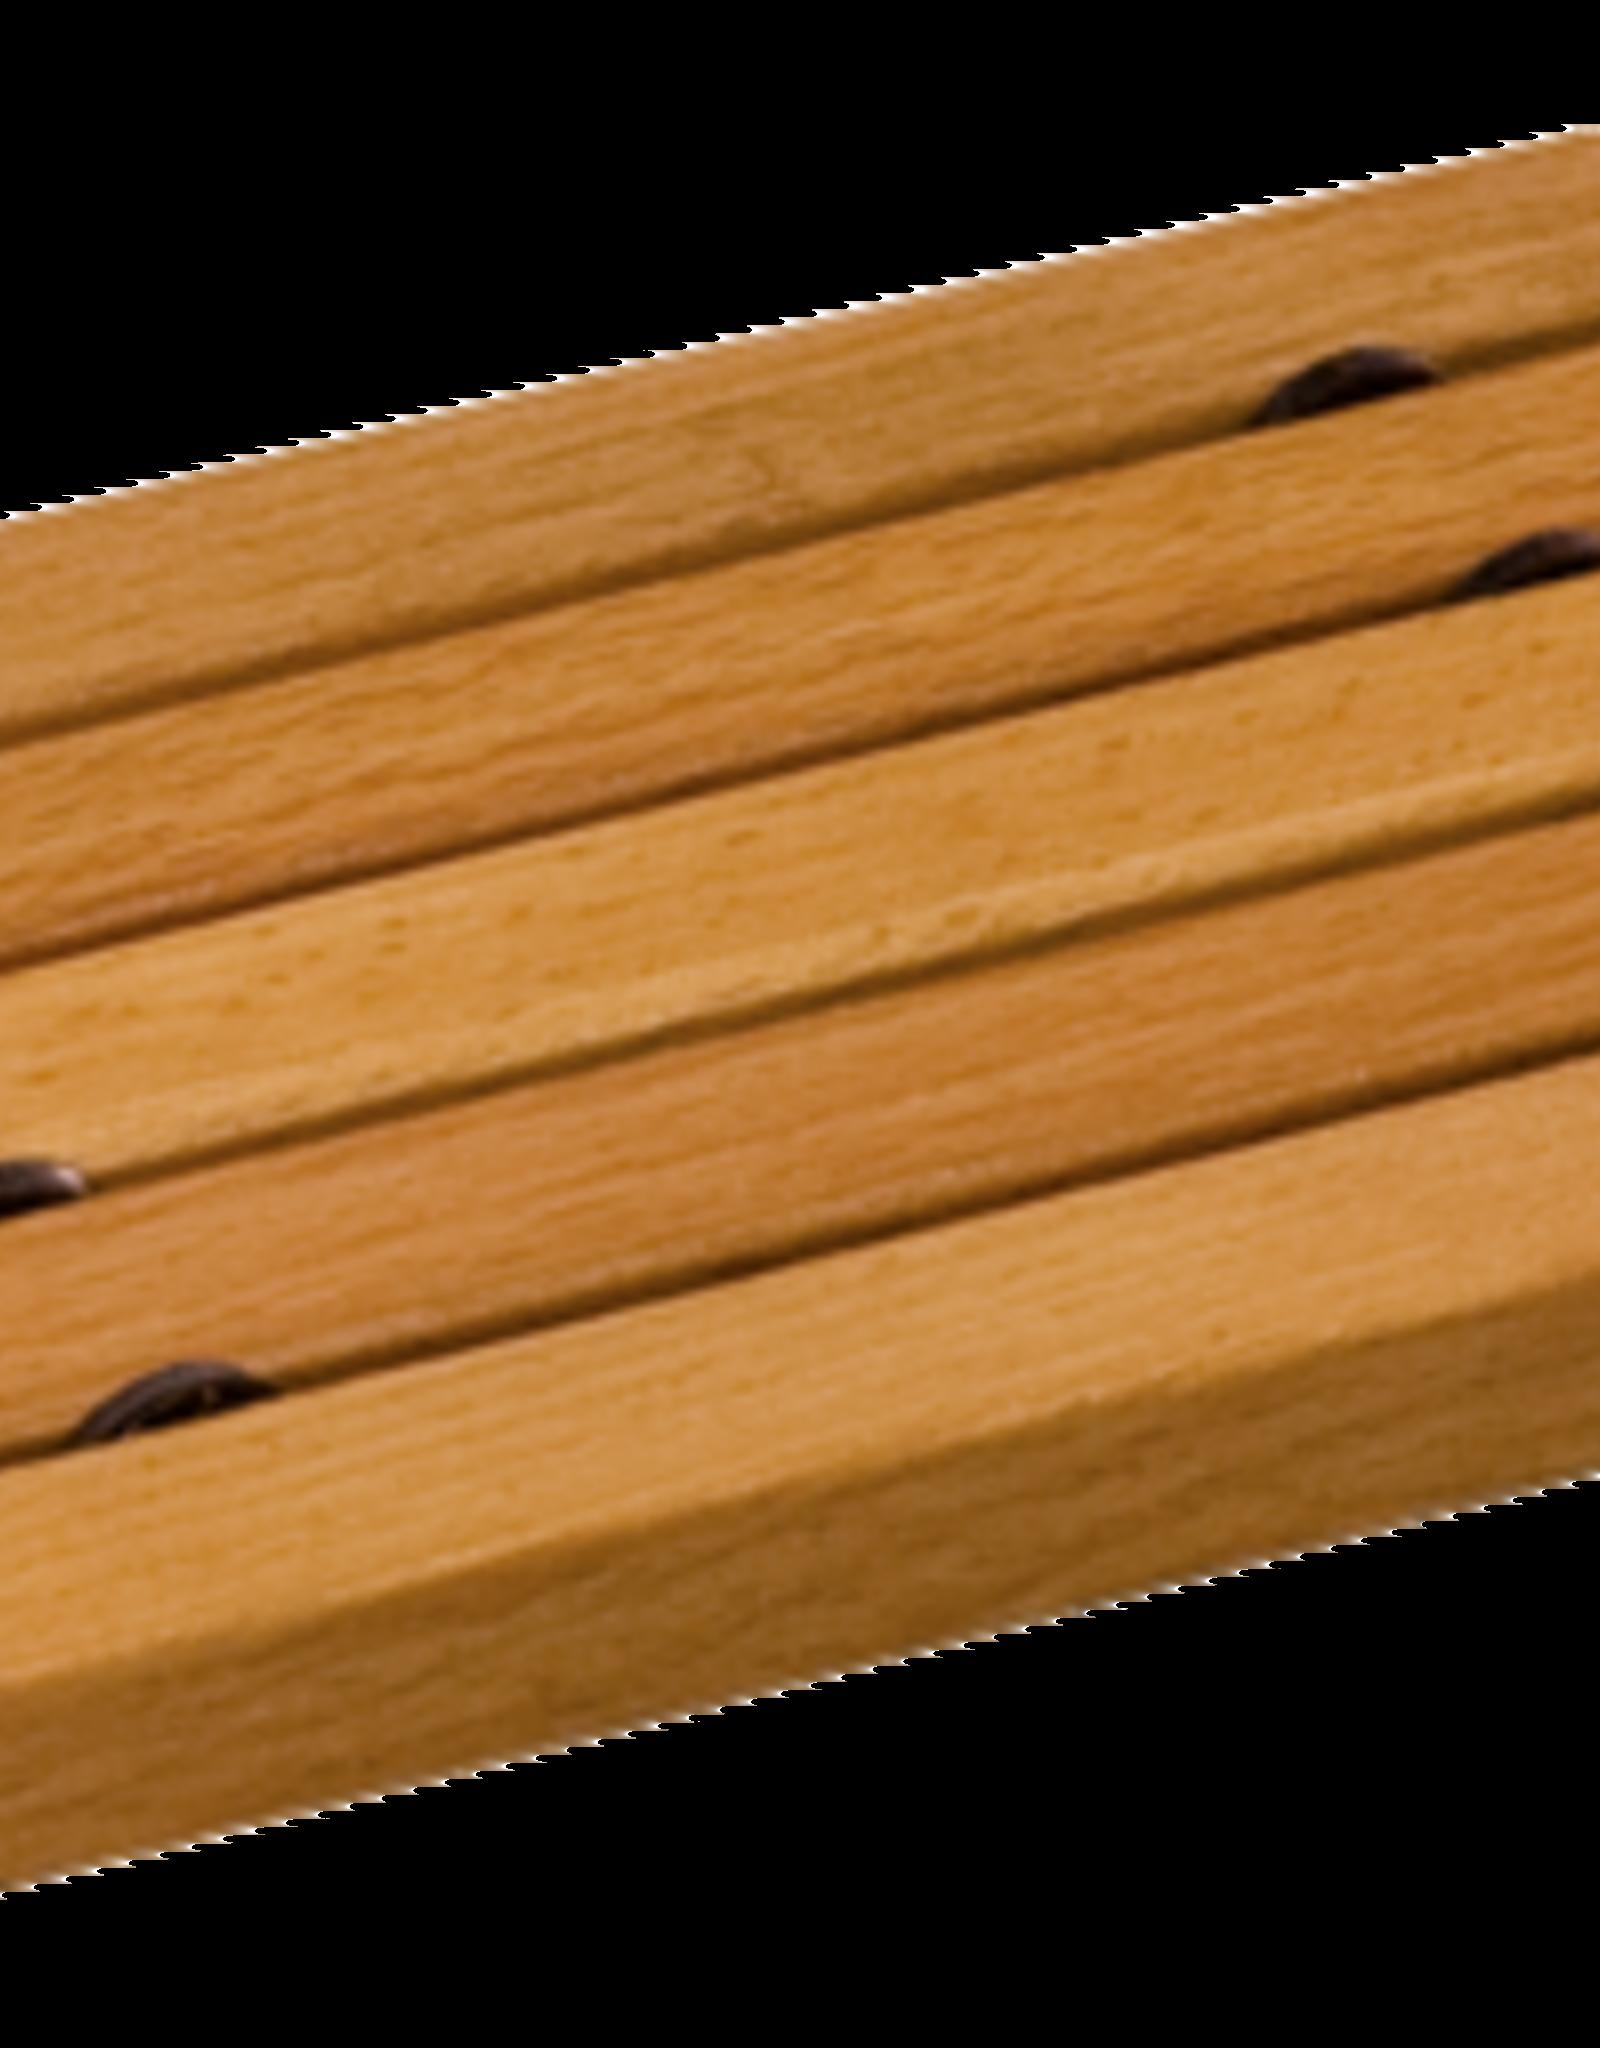 Redecker Wooden Soap Dish- Flat Oiled Beechwood